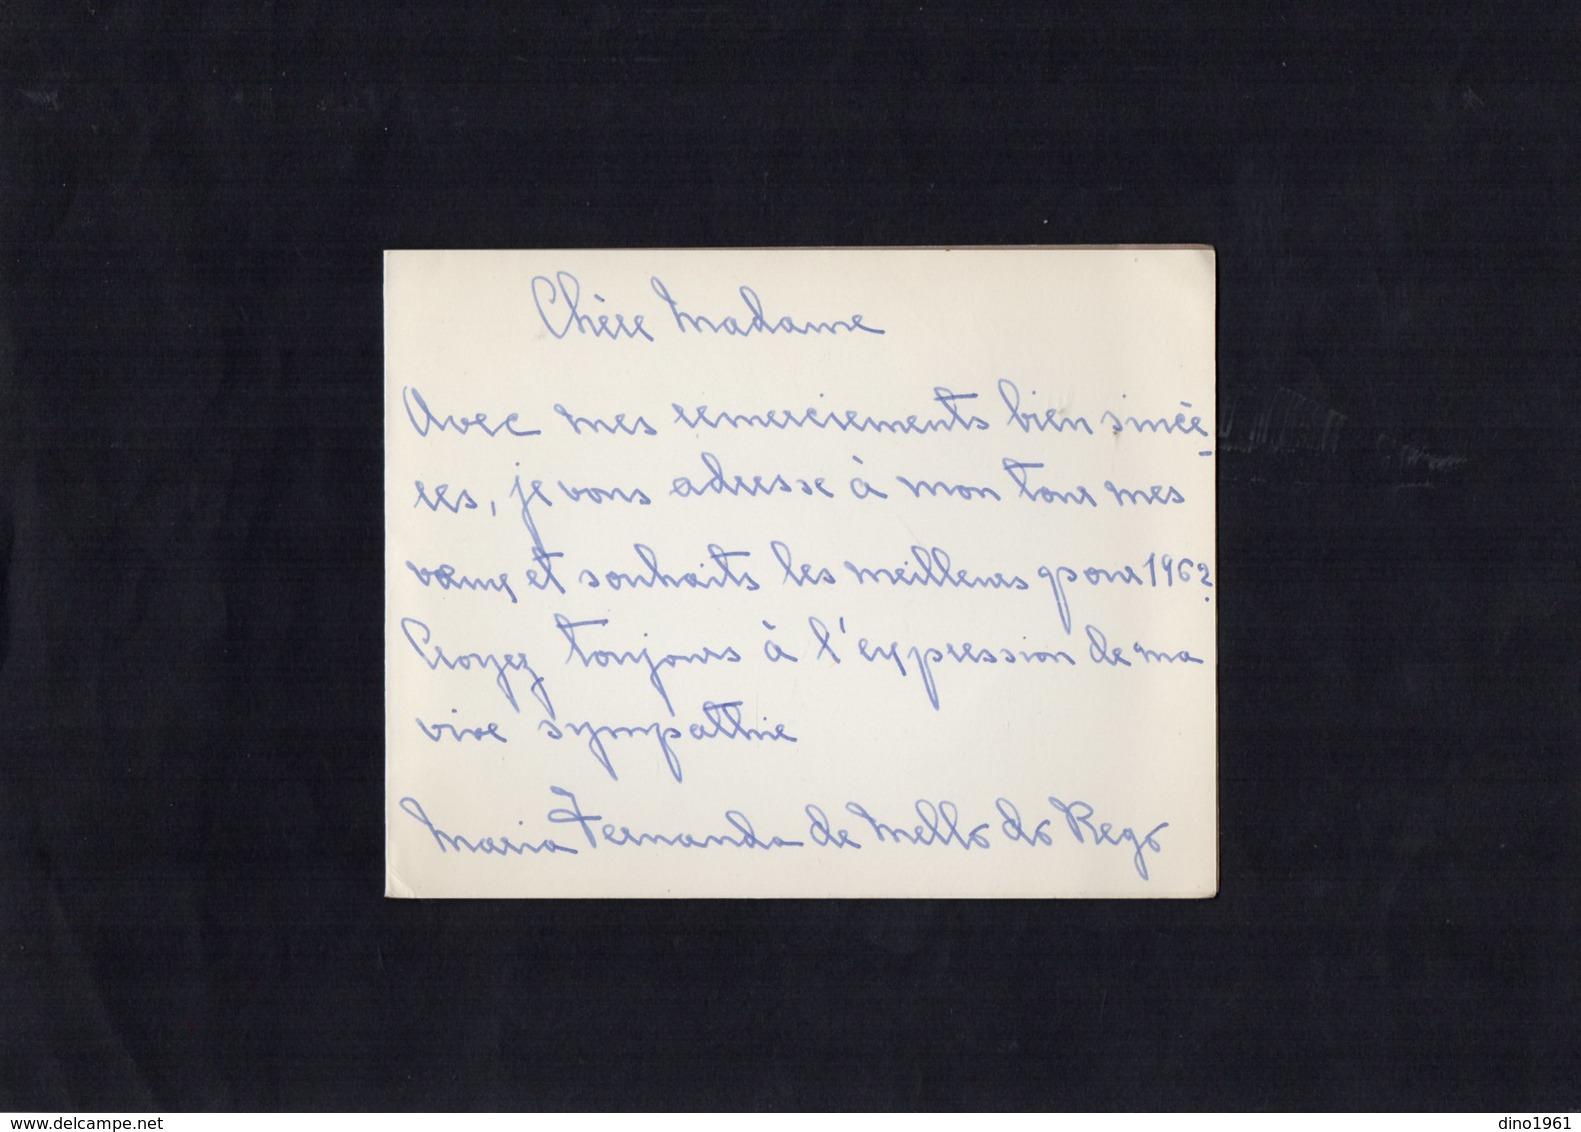 VP13.545 - Portugal - Noblesse - Autographe X 3 De Mme Maria Fernanda De MELLO DO REGO - Autographes